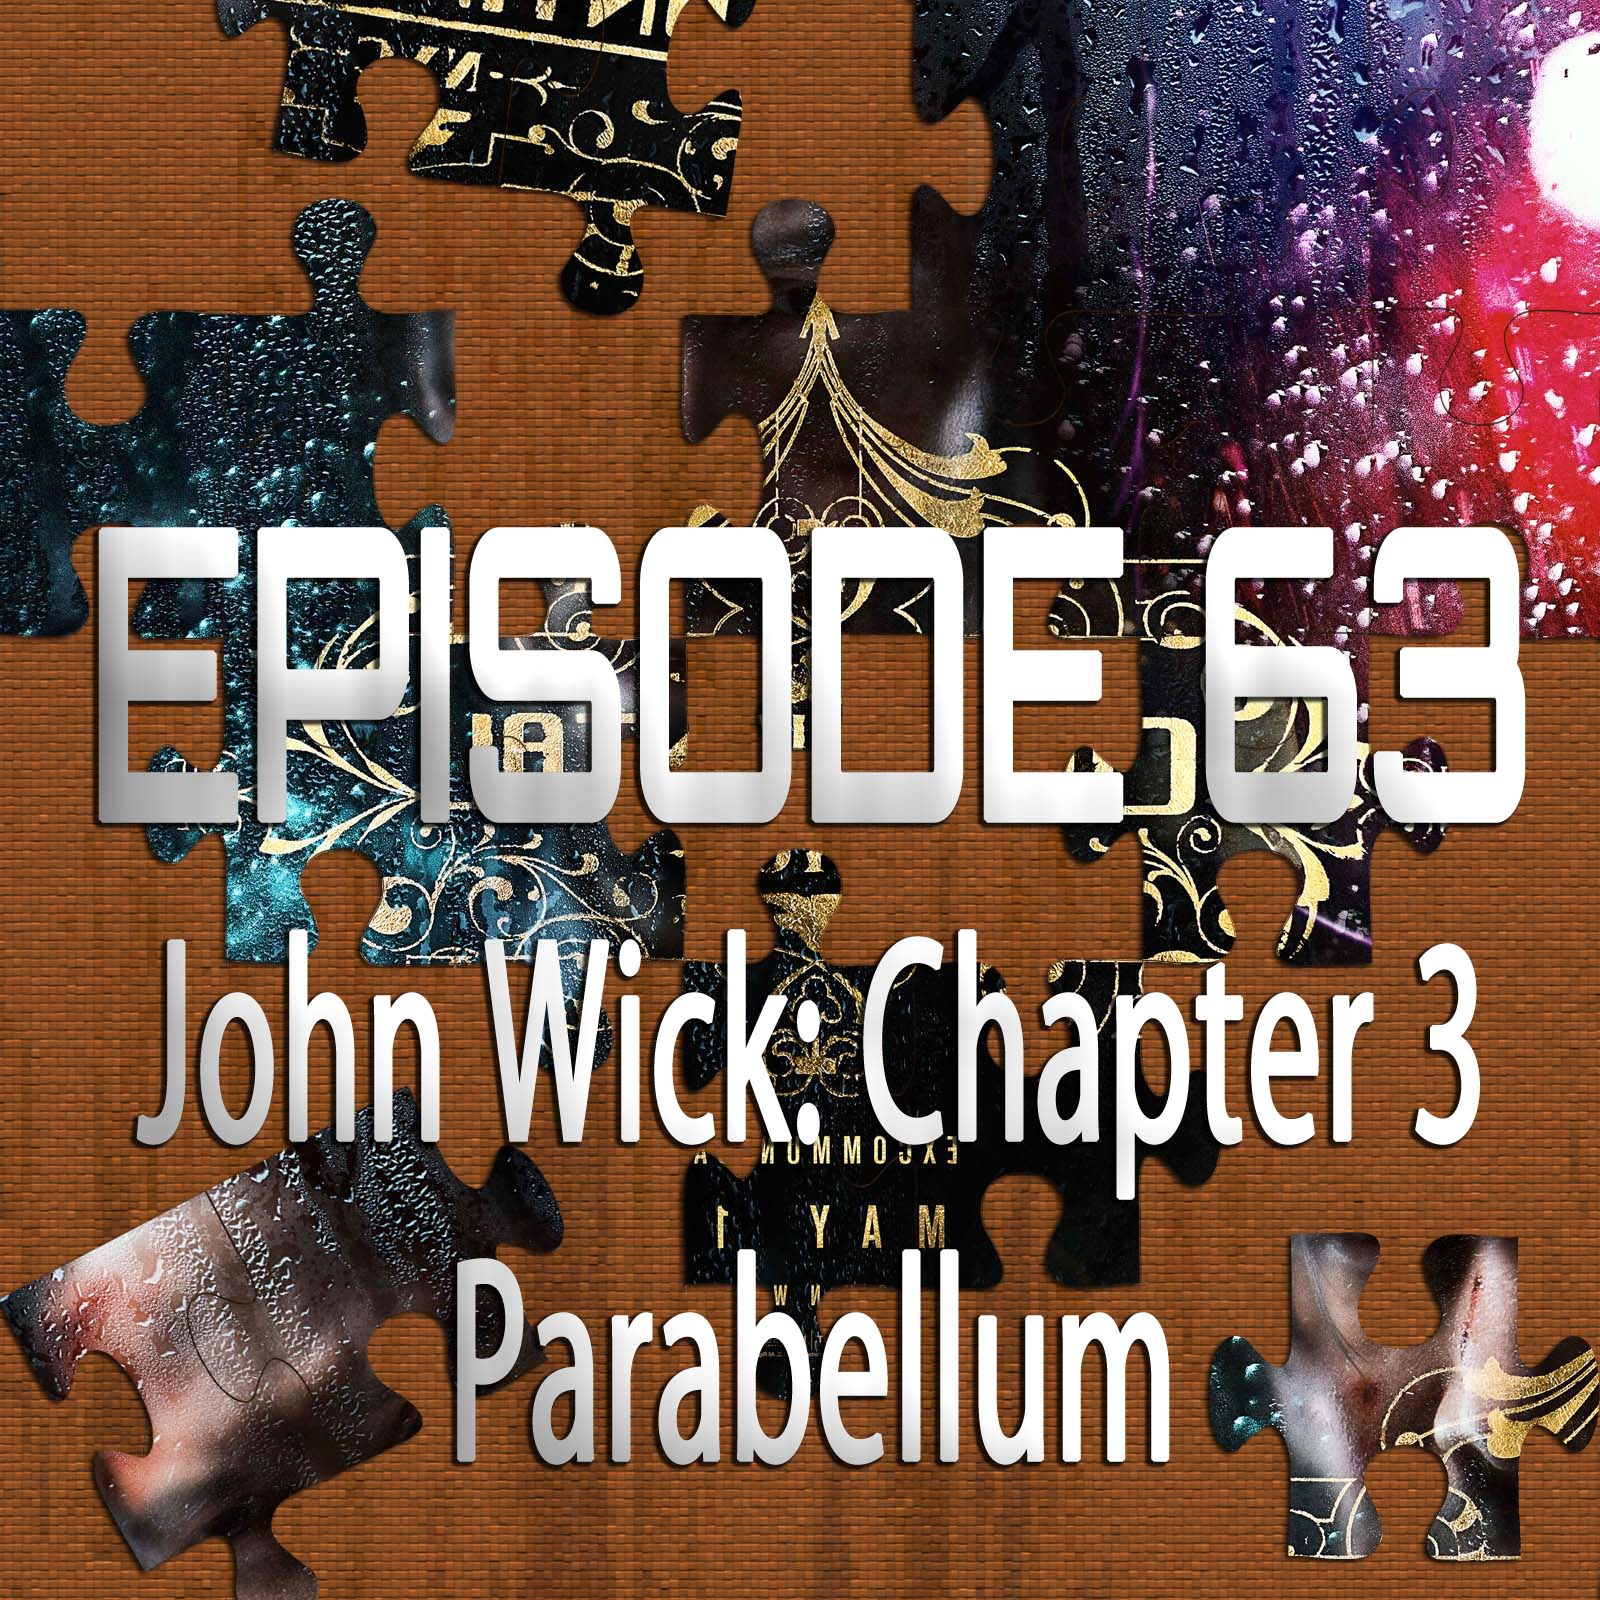 John Wick: Chapter 3 – Parabellum (Featuring Sean Malloy)